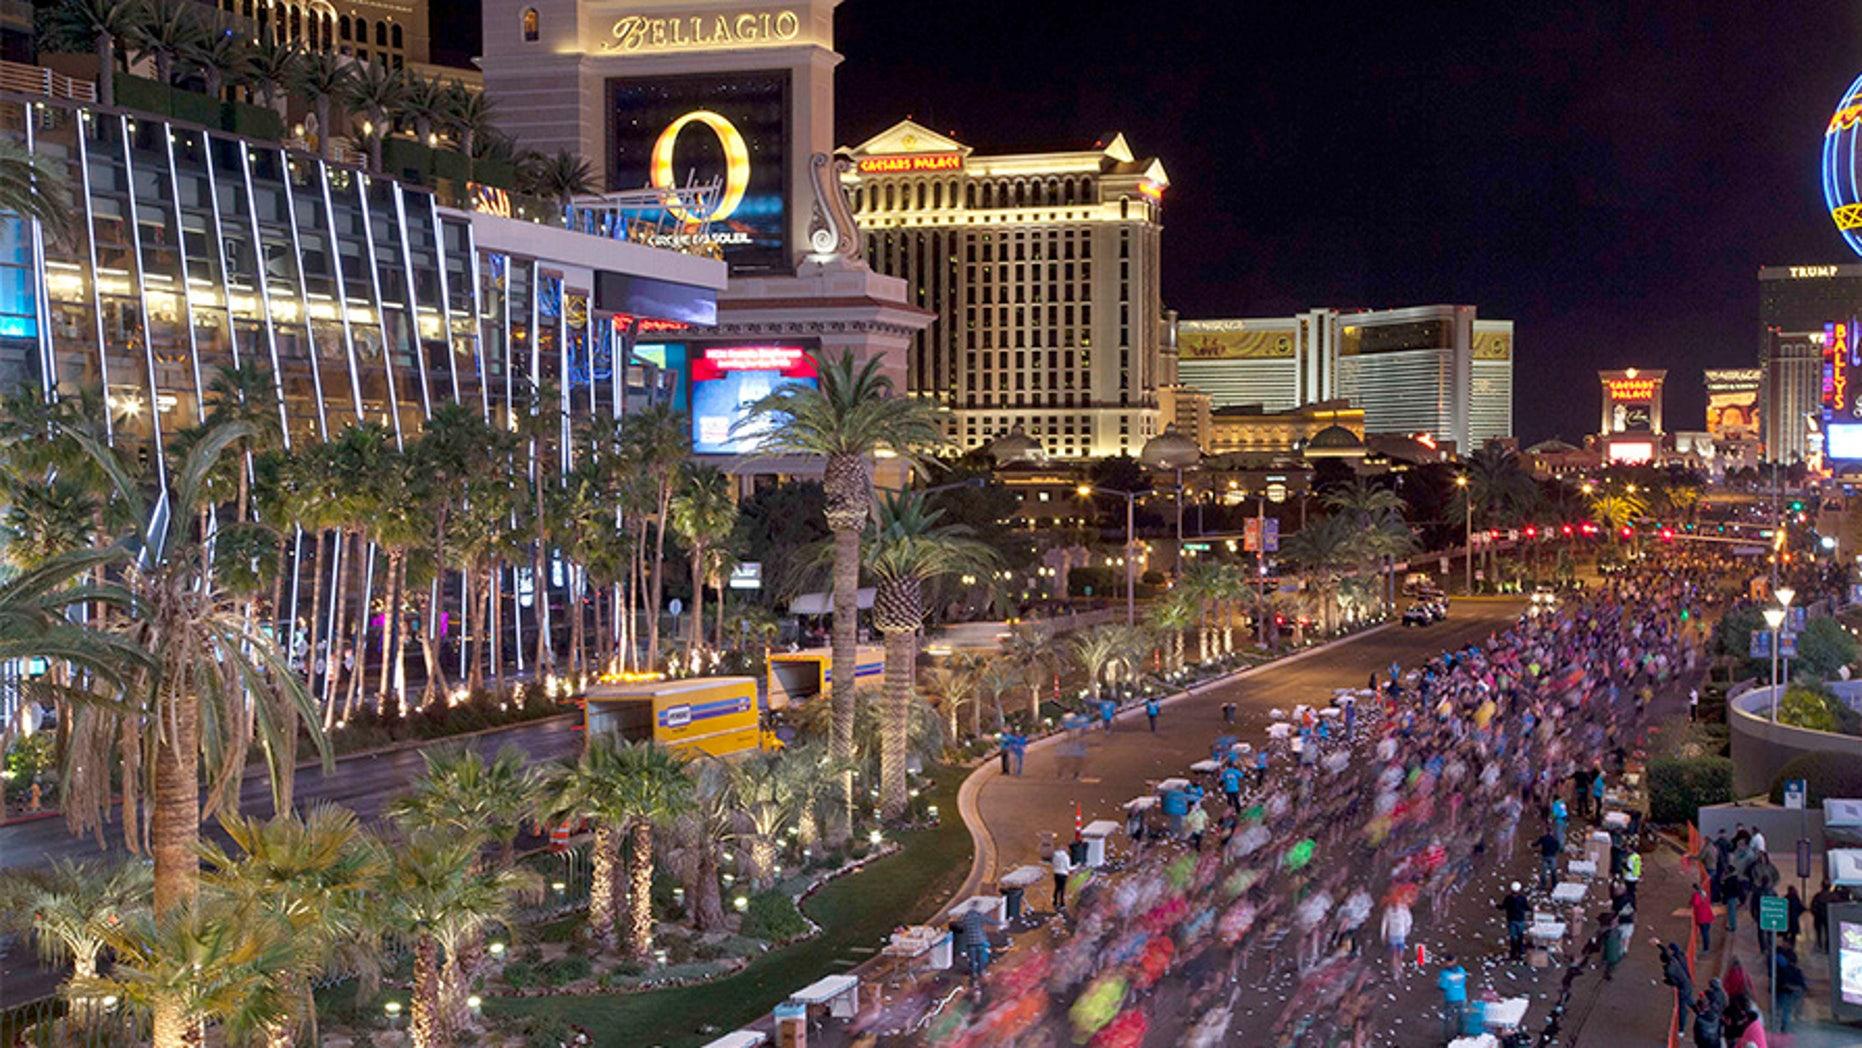 In this Dec. 4, 2011 file photo, runners stream southward on Las Vegas Boulevard during the Rock 'n Roll Las Vegas Marathon in Las Vegas.